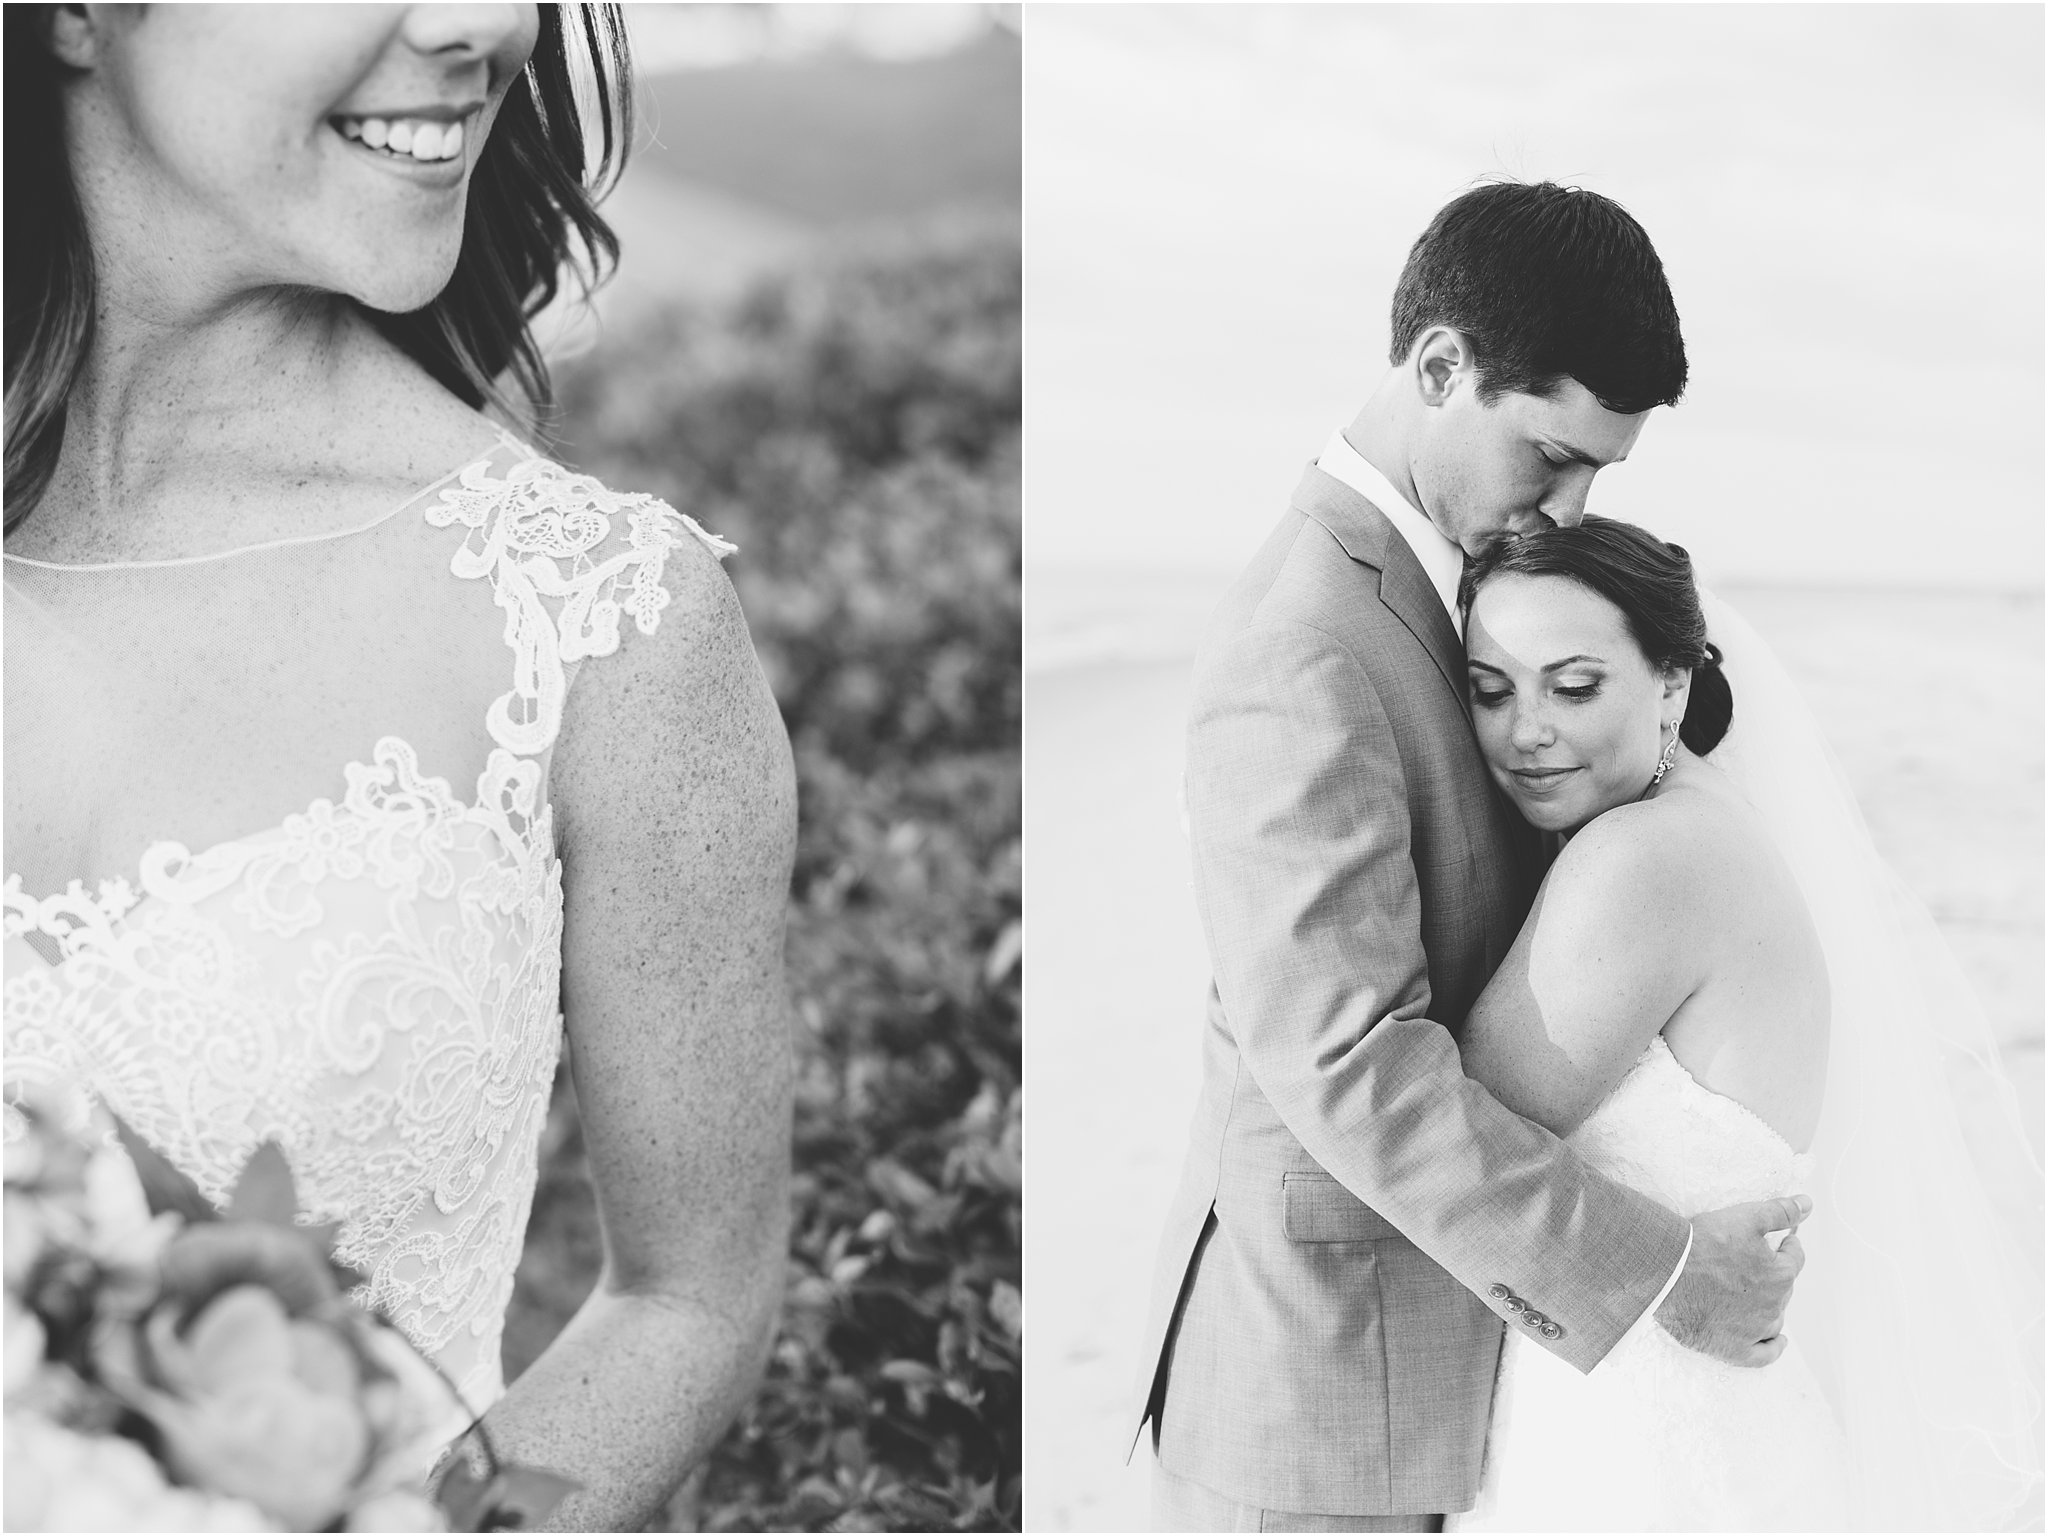 jessica_ryan_photography_wedding_photography_virginiabeach_virginia_candid_authentic_bride_tips_wedding_planning_tips_bridal_tips_1987